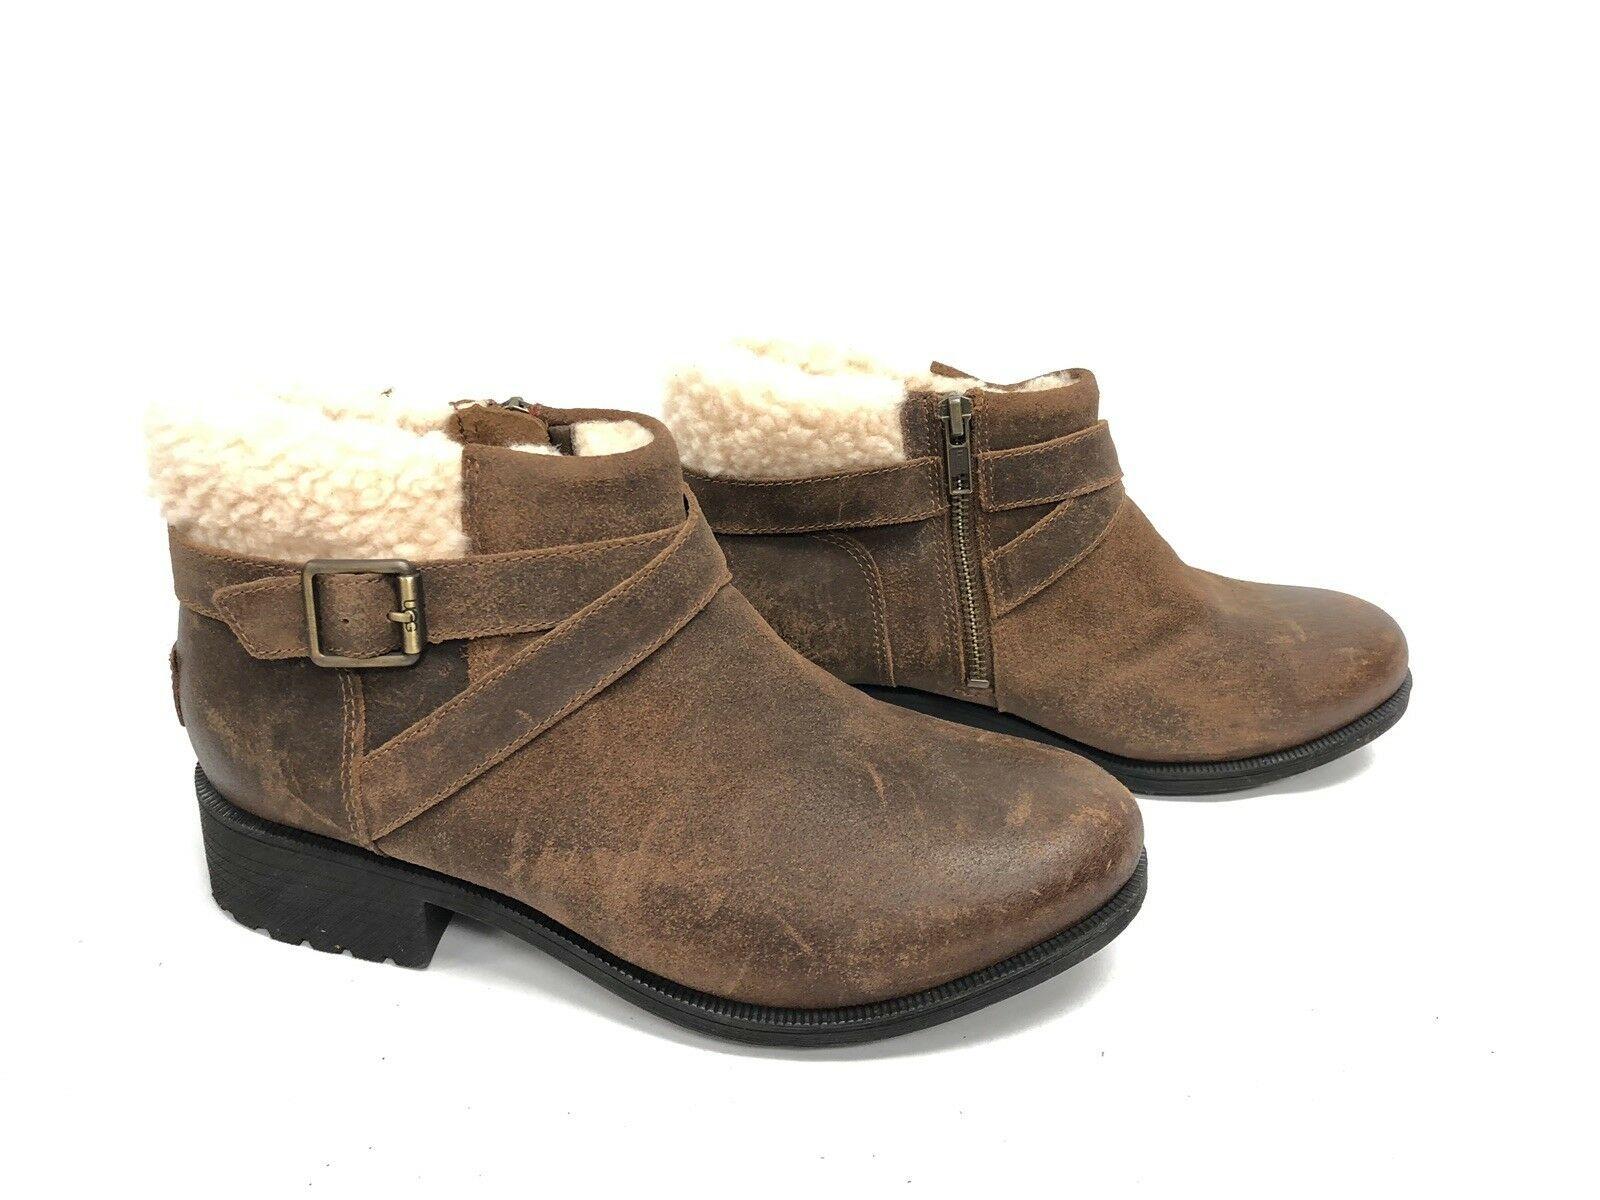 UGG Australia BENSON Buckle Sheepskin Ankle Booties 1095151 Chipmunk Waterproof image 4